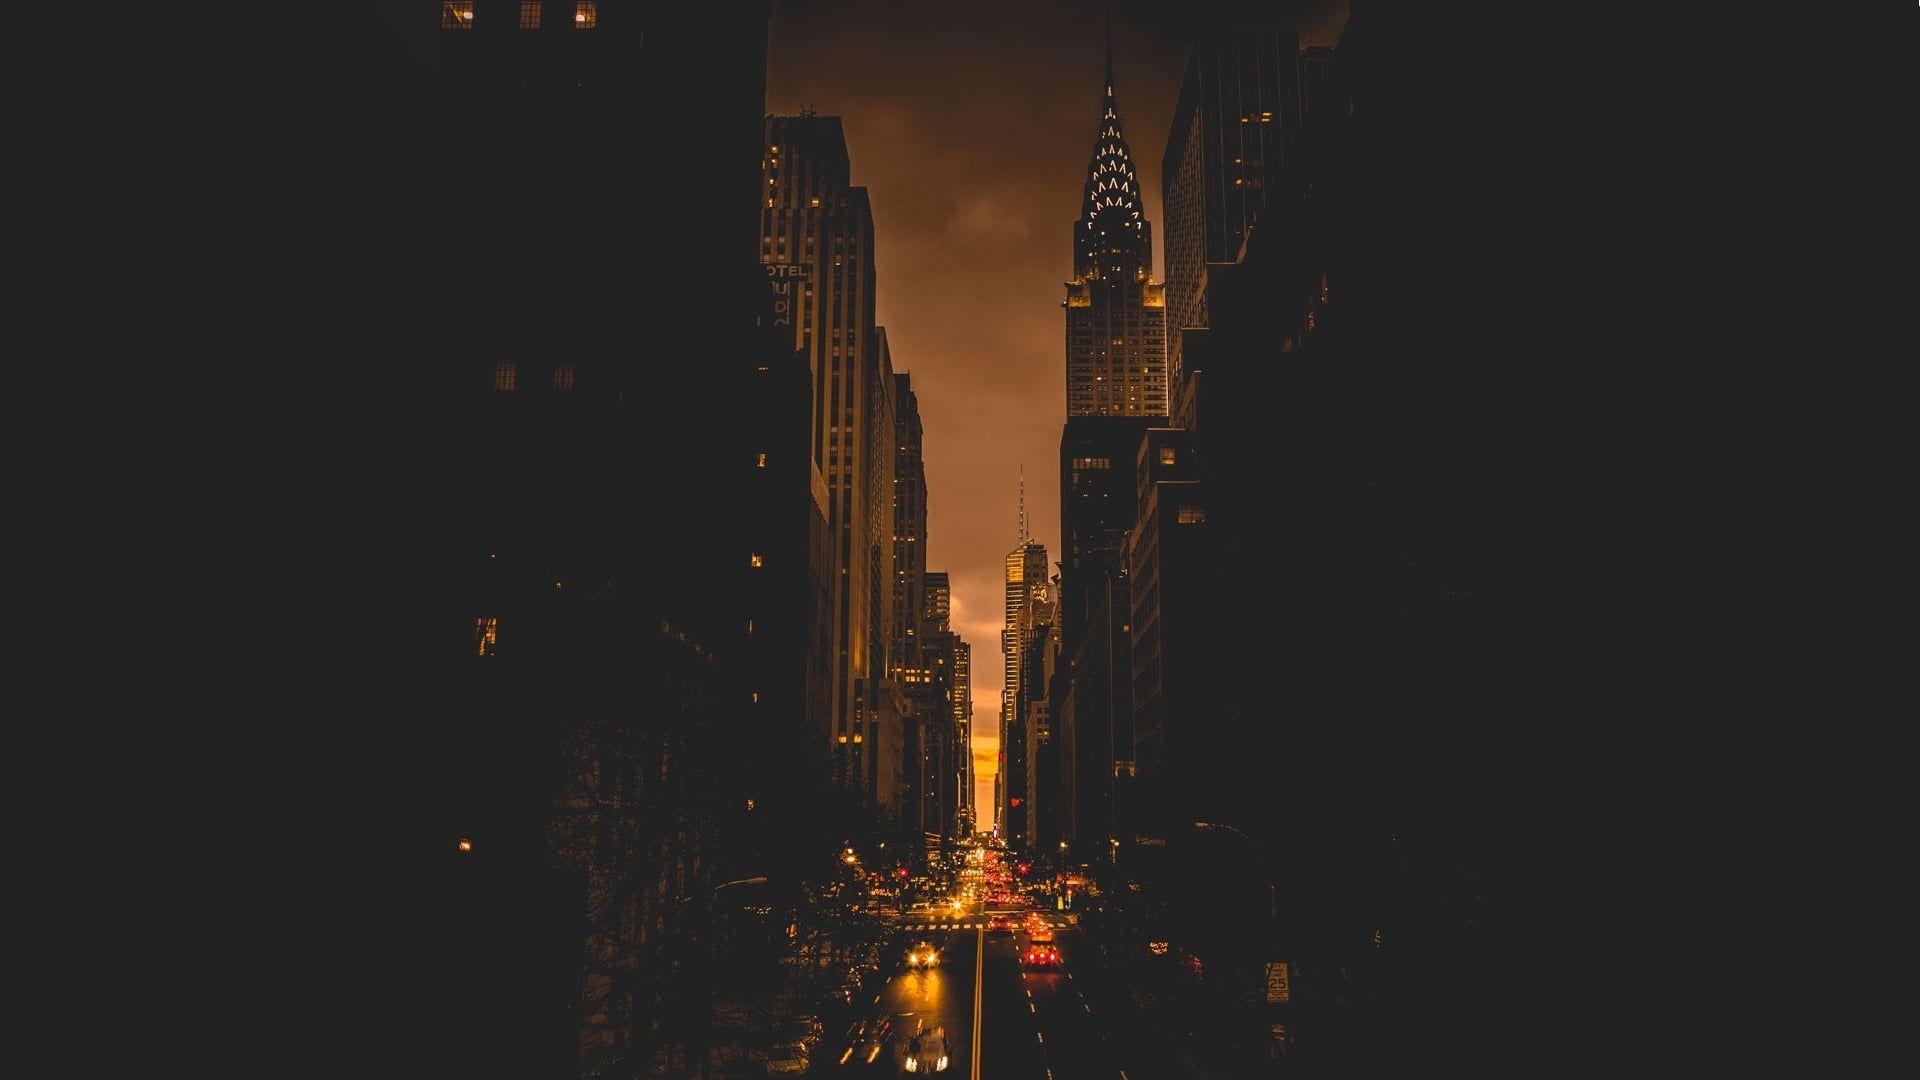 Concrete Buildings New York City Evening Town Street Light Dark 1080p Wallpaper Hdwallpaper Desktop Panoramic Photography Futuristic City City Wallpaper